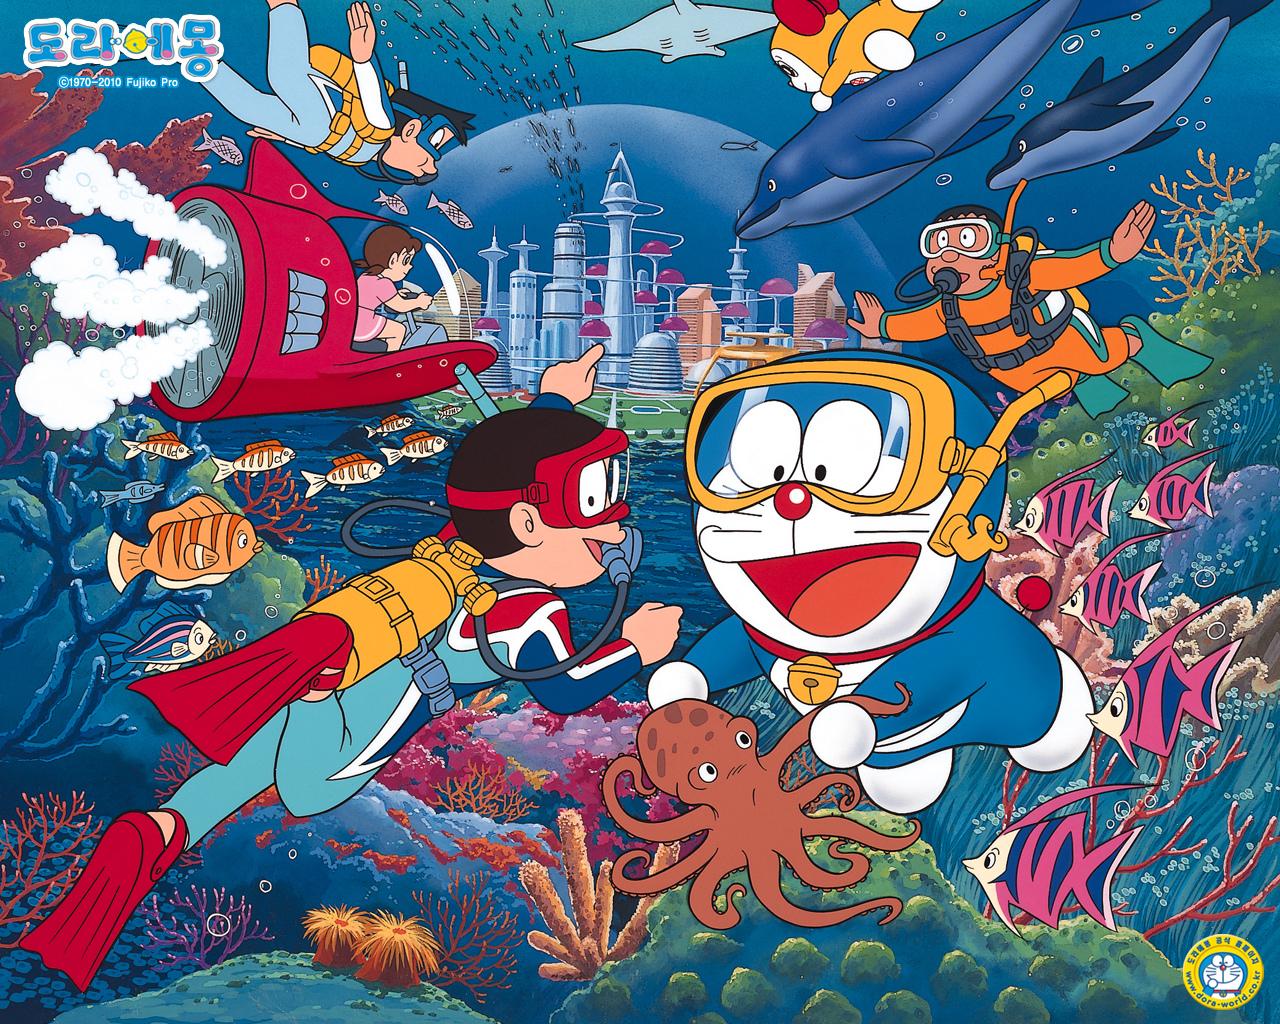 Fondos de pantalla de Doraemon, Wallpapers HD Gratis